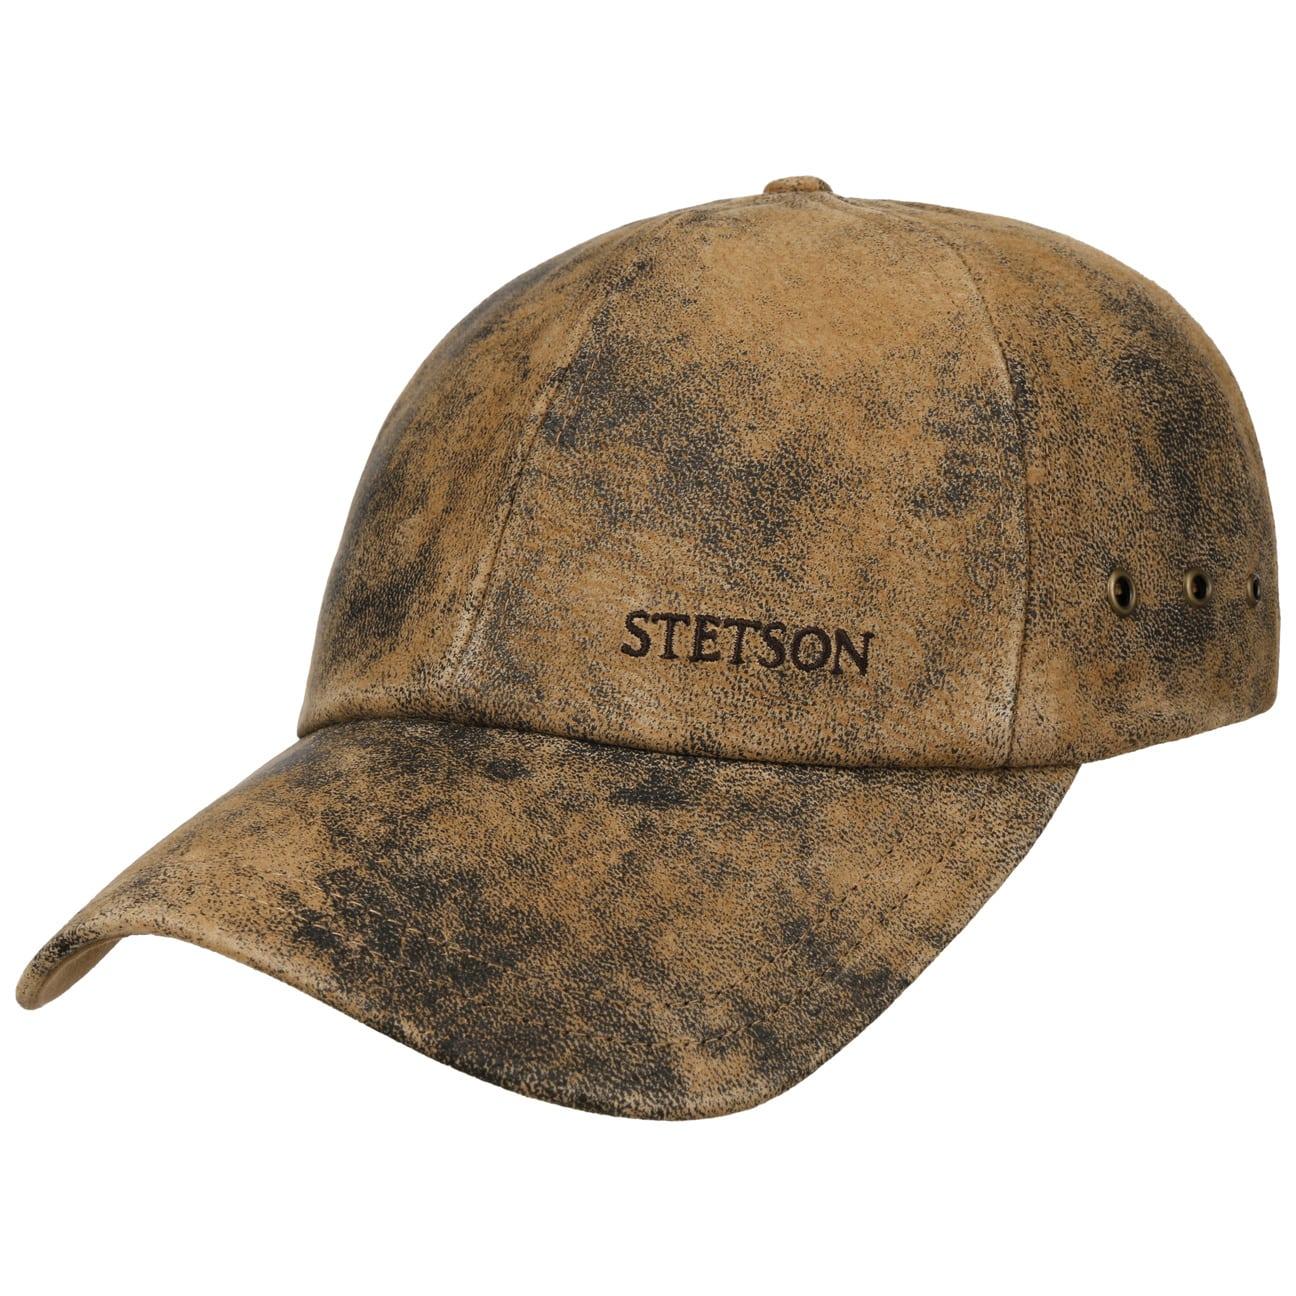 ... Rawlins Pigskin Baseball Cap by Stetson - brown 6 ... c471a9c51c7